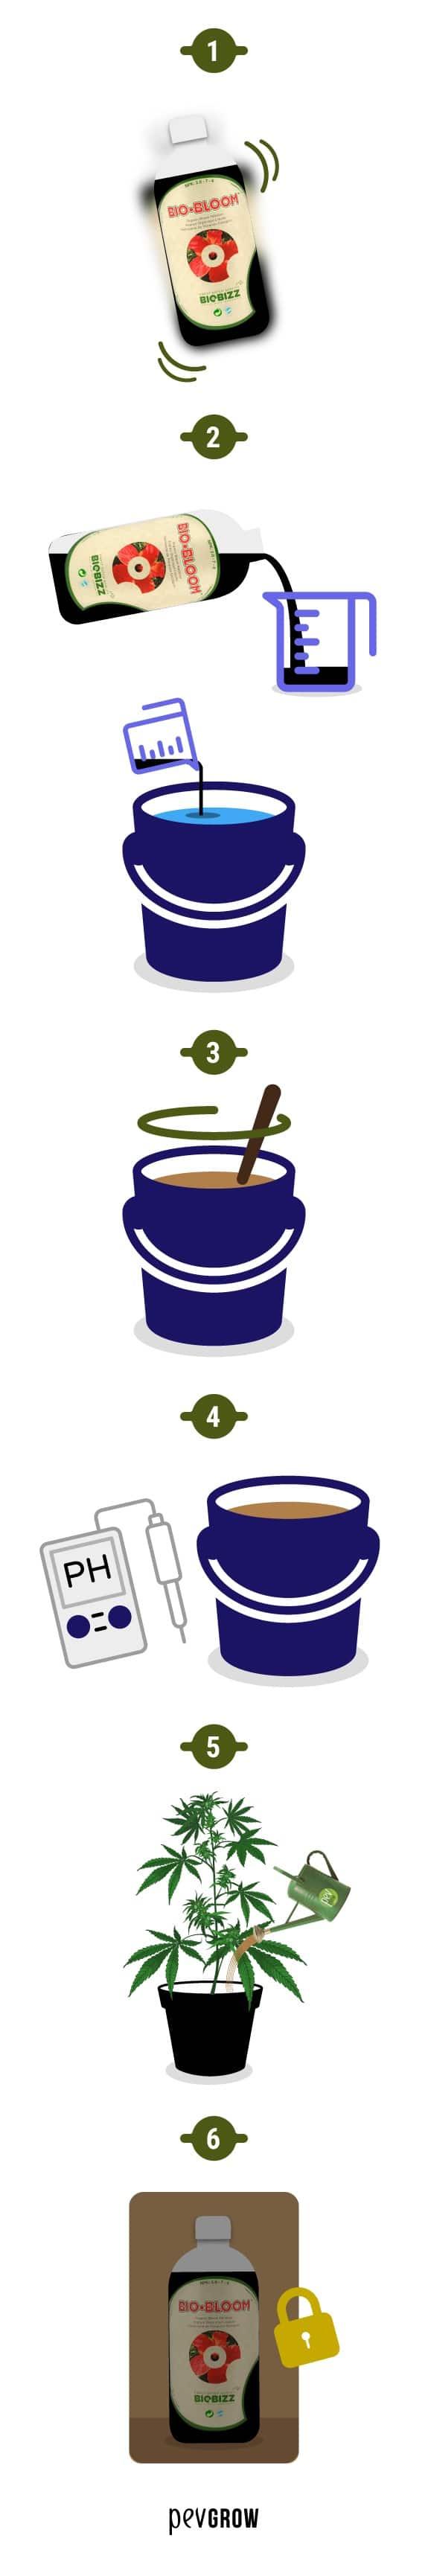 Infografia para utilizar los fertilizantes Biobizz